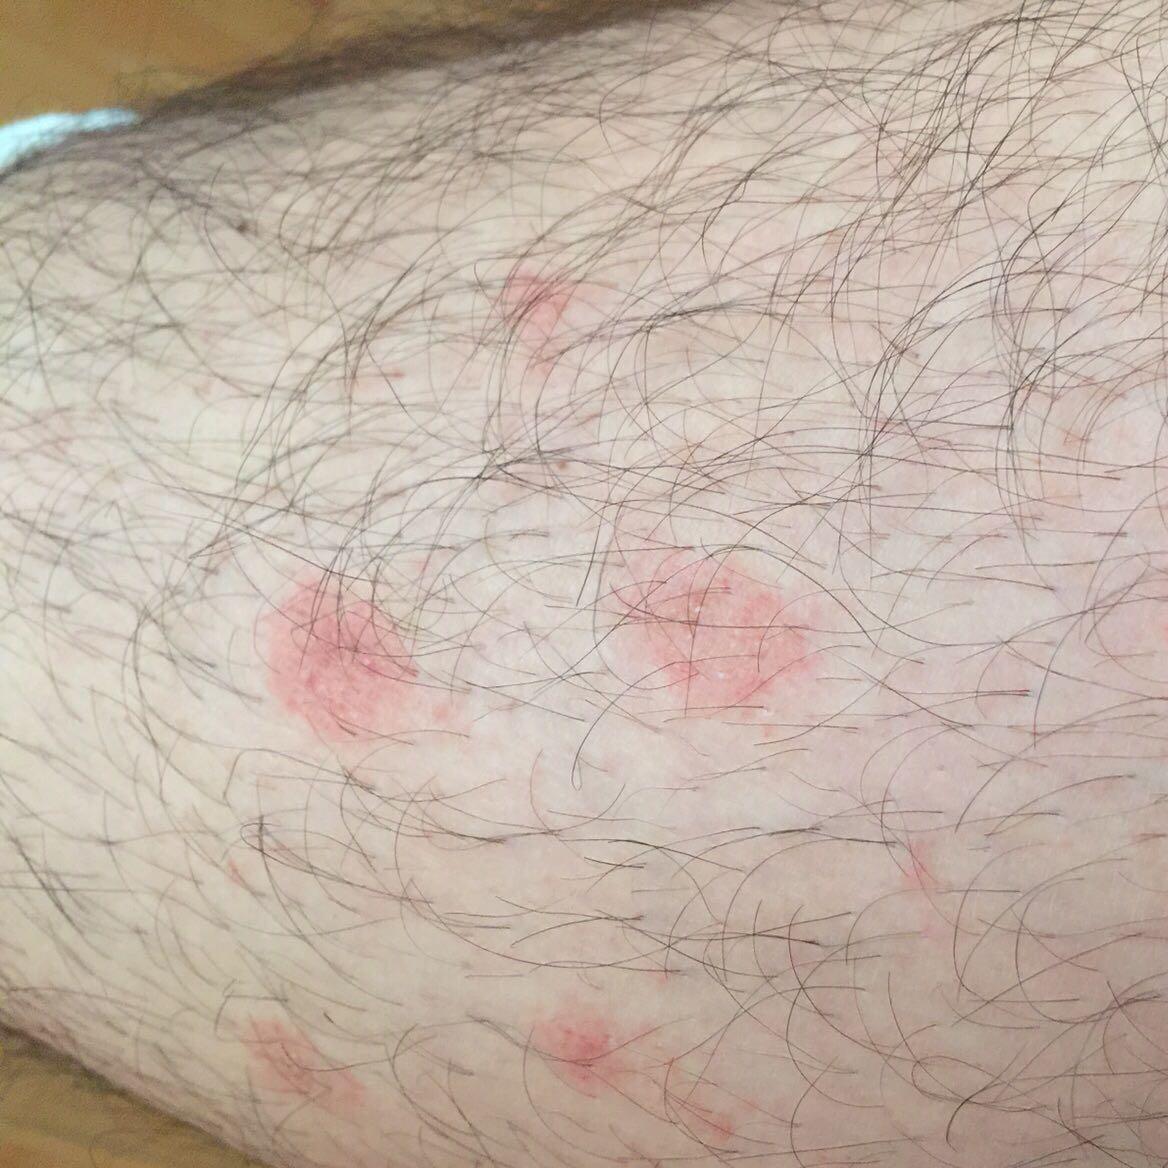 Die Behandlung der Thrombophlebitis subkutan Venen